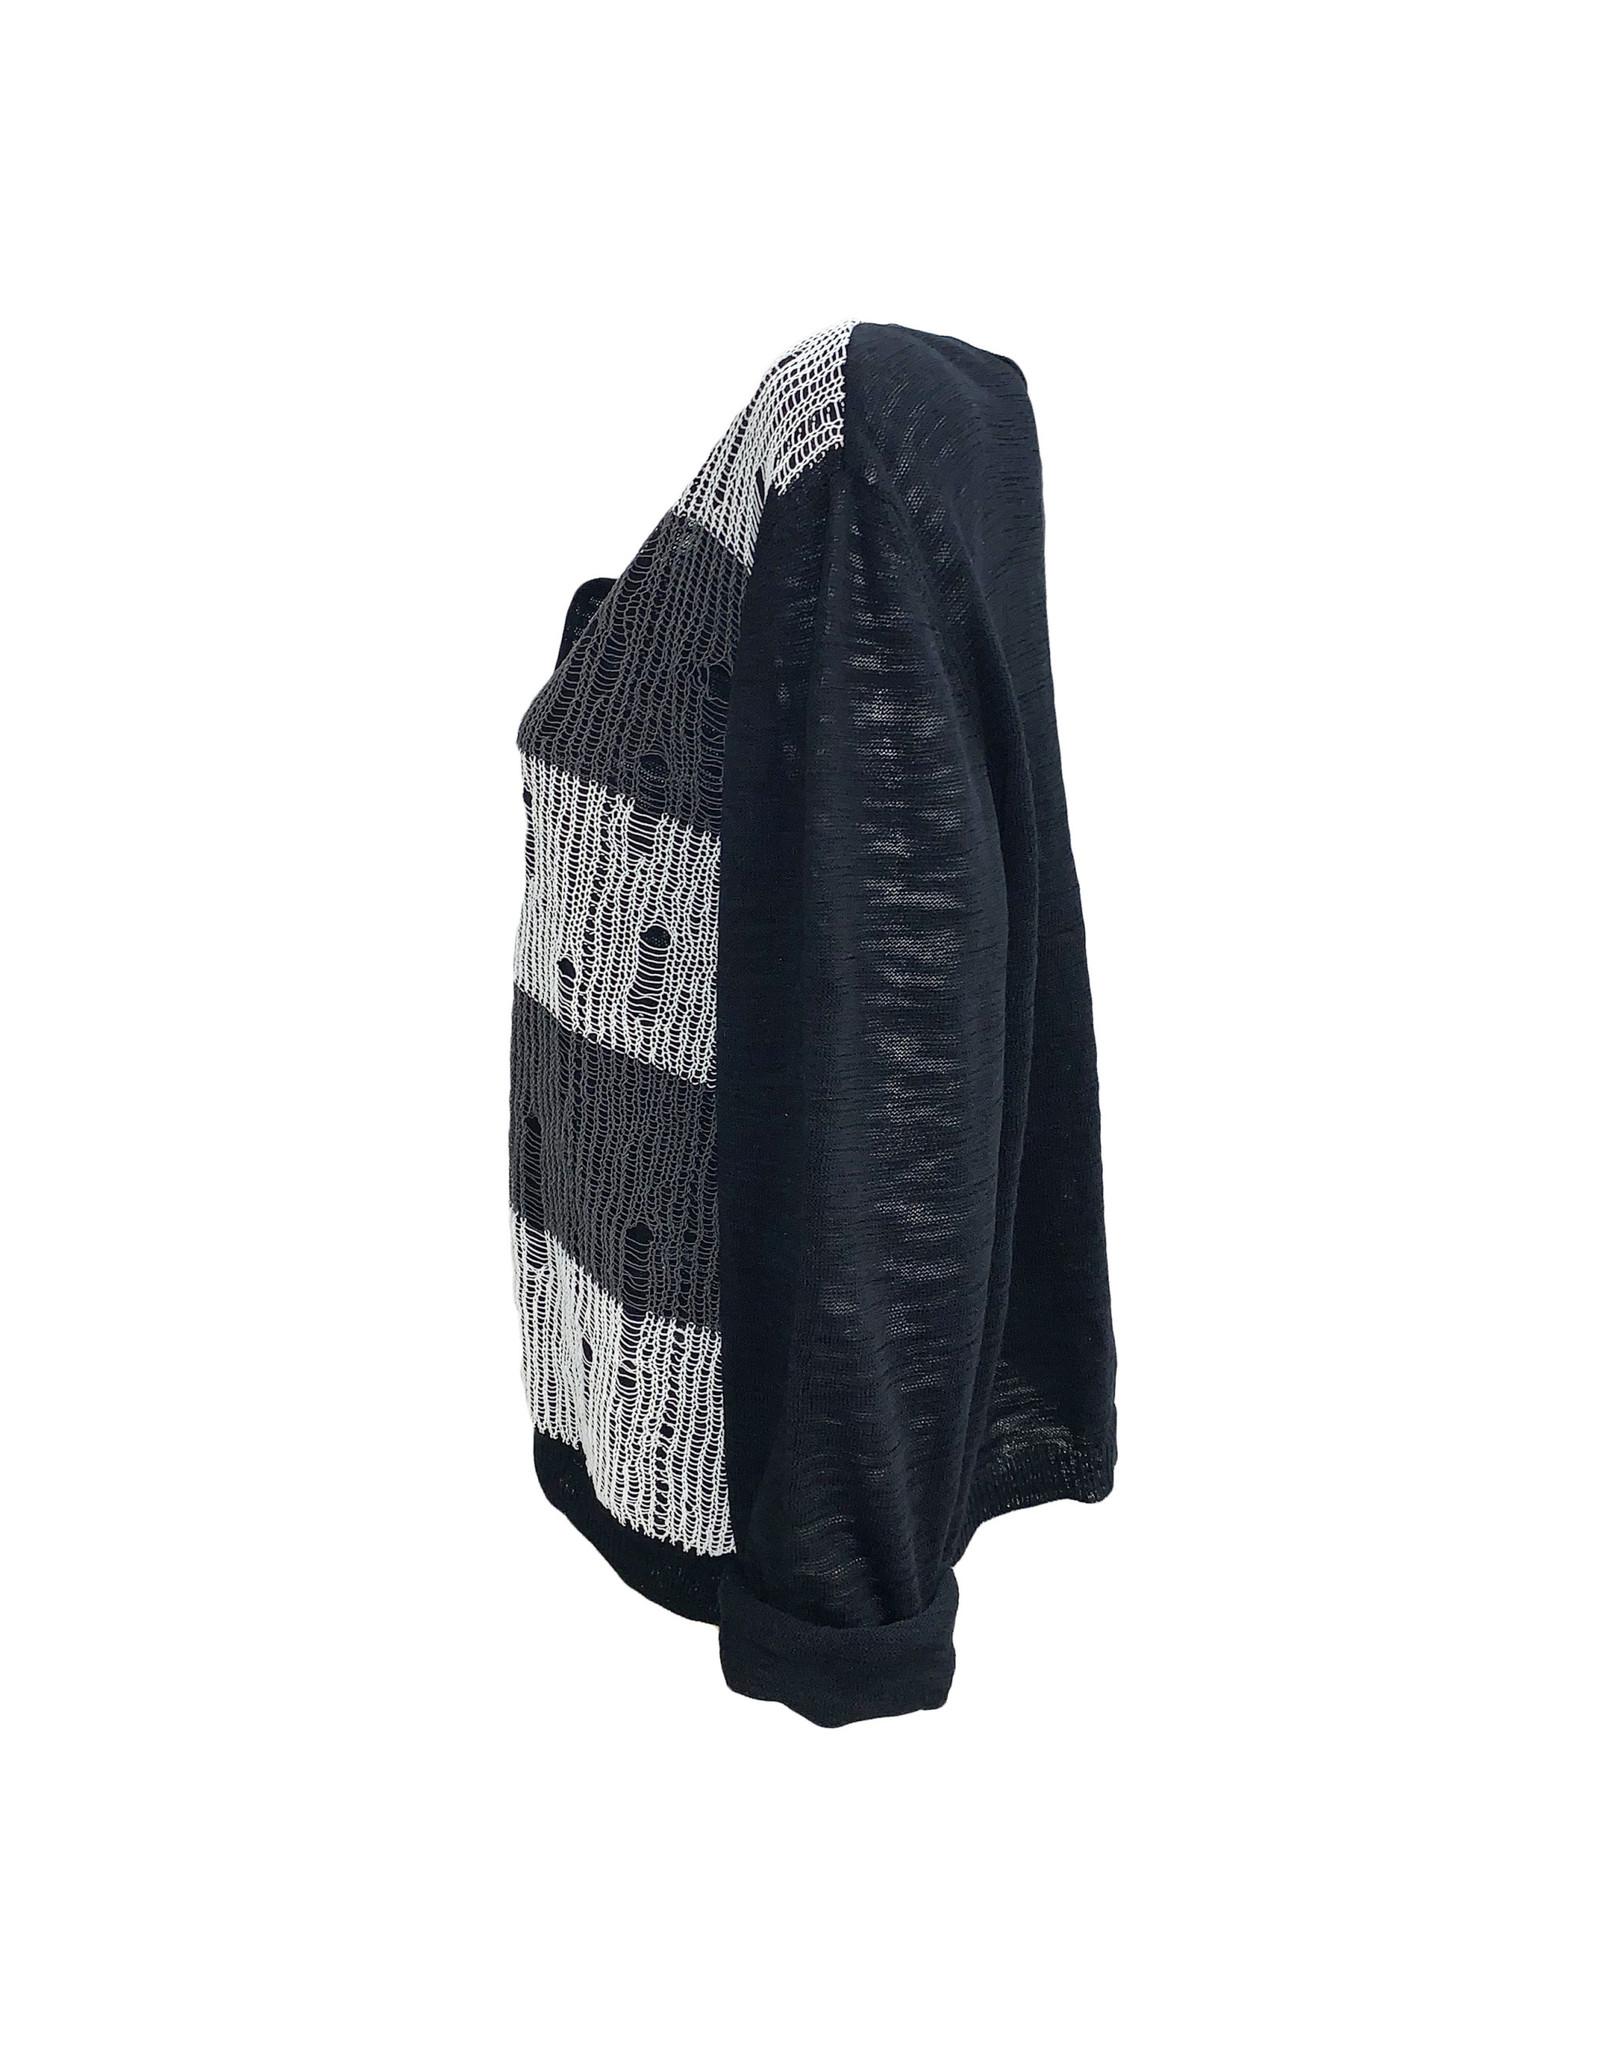 Crea Concept Crea Concept 2 Button Cardigan-Black/Grey/White